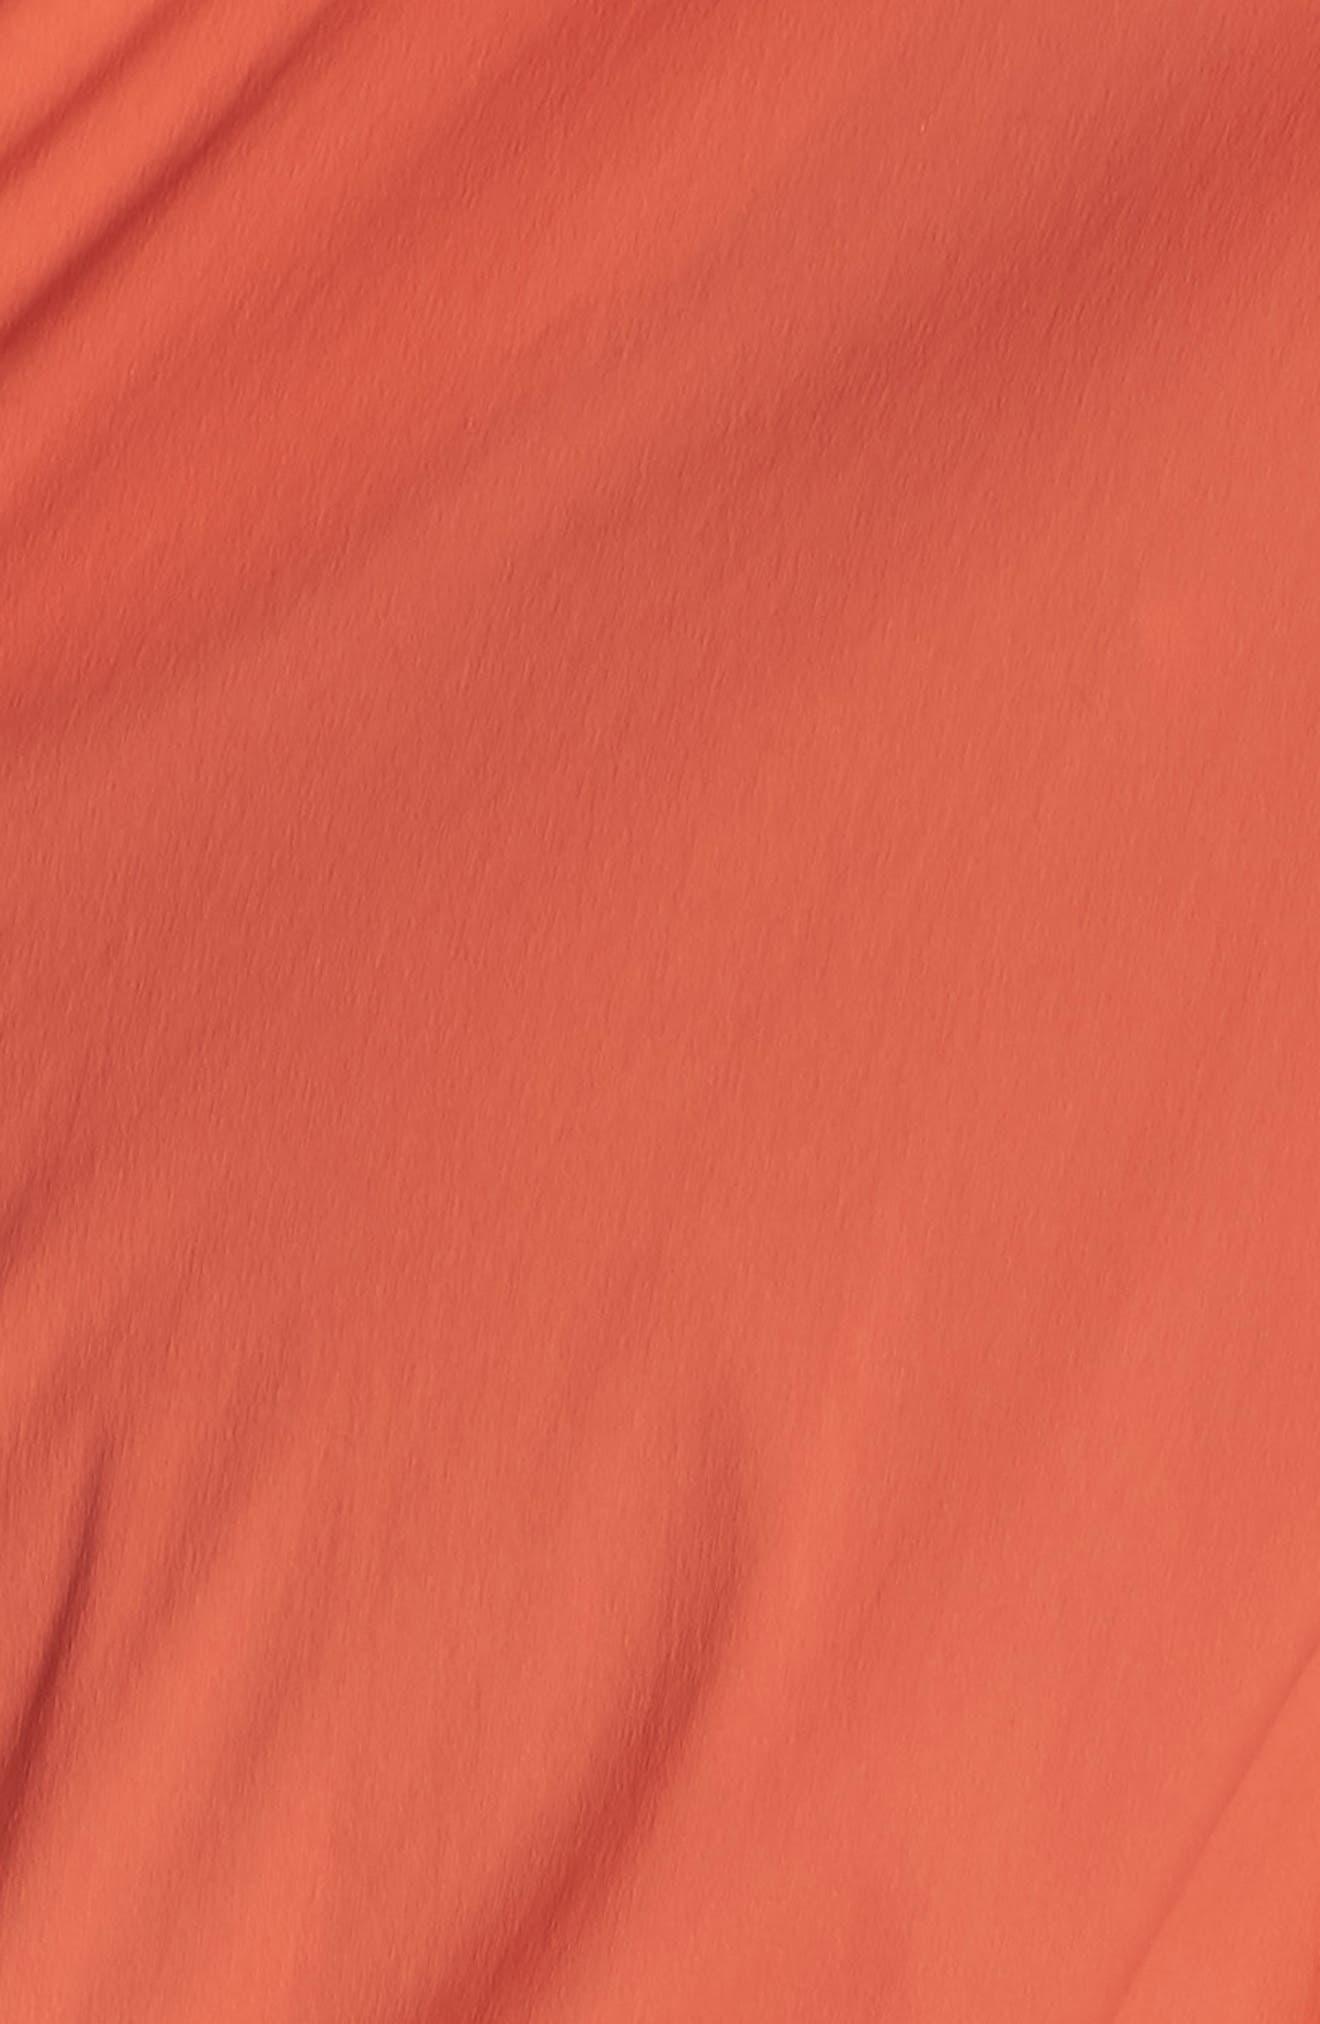 ADIDAS BY STELLA MCCARTNEY, Climastorm<sup>®</sup> Run Jacket, Alternate thumbnail 7, color, HOT CORAL